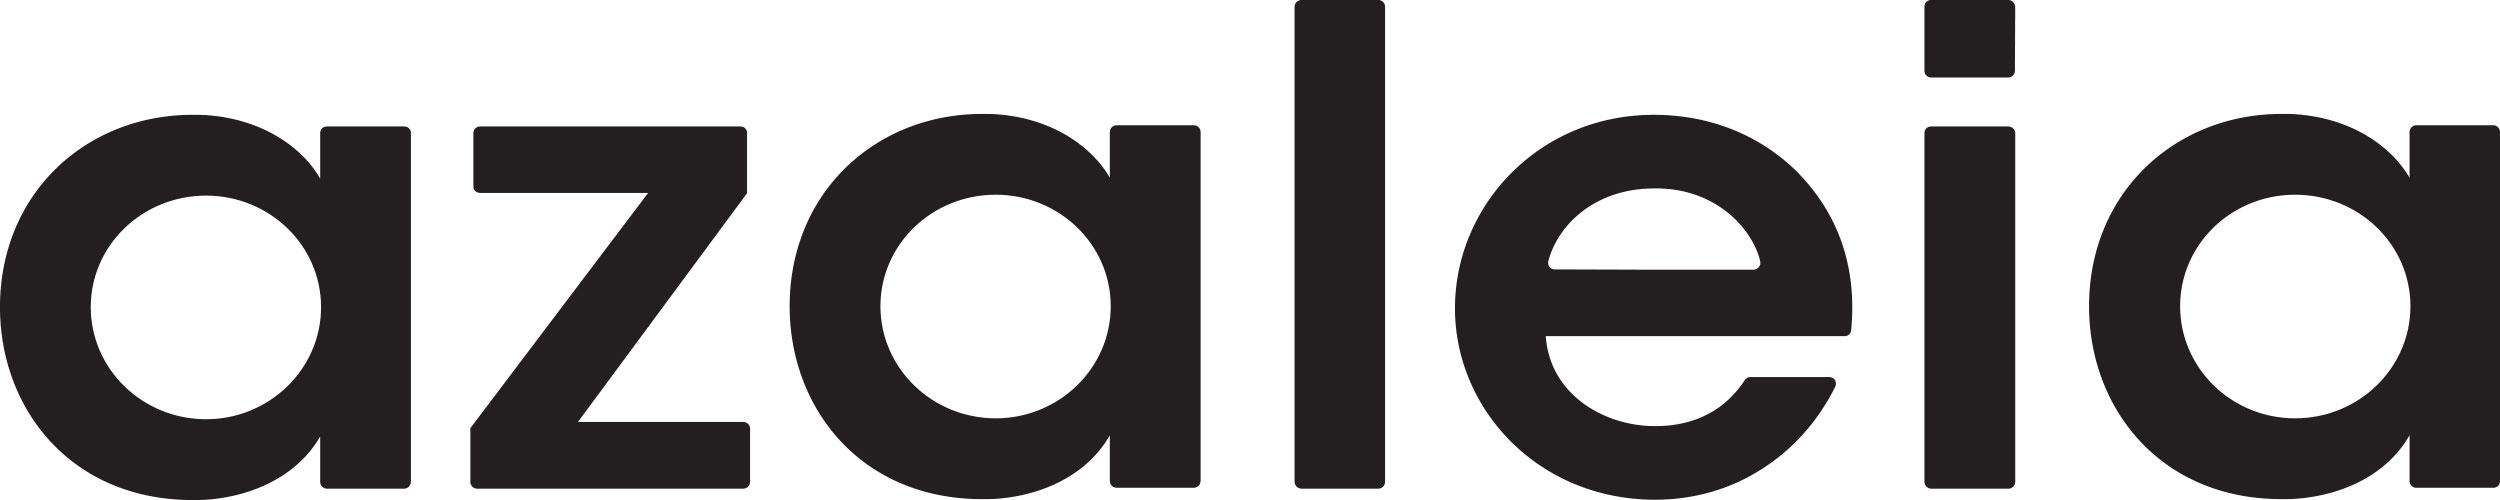 Azaleia - Azaleia PNG - Azaleia Logo Vector PNG